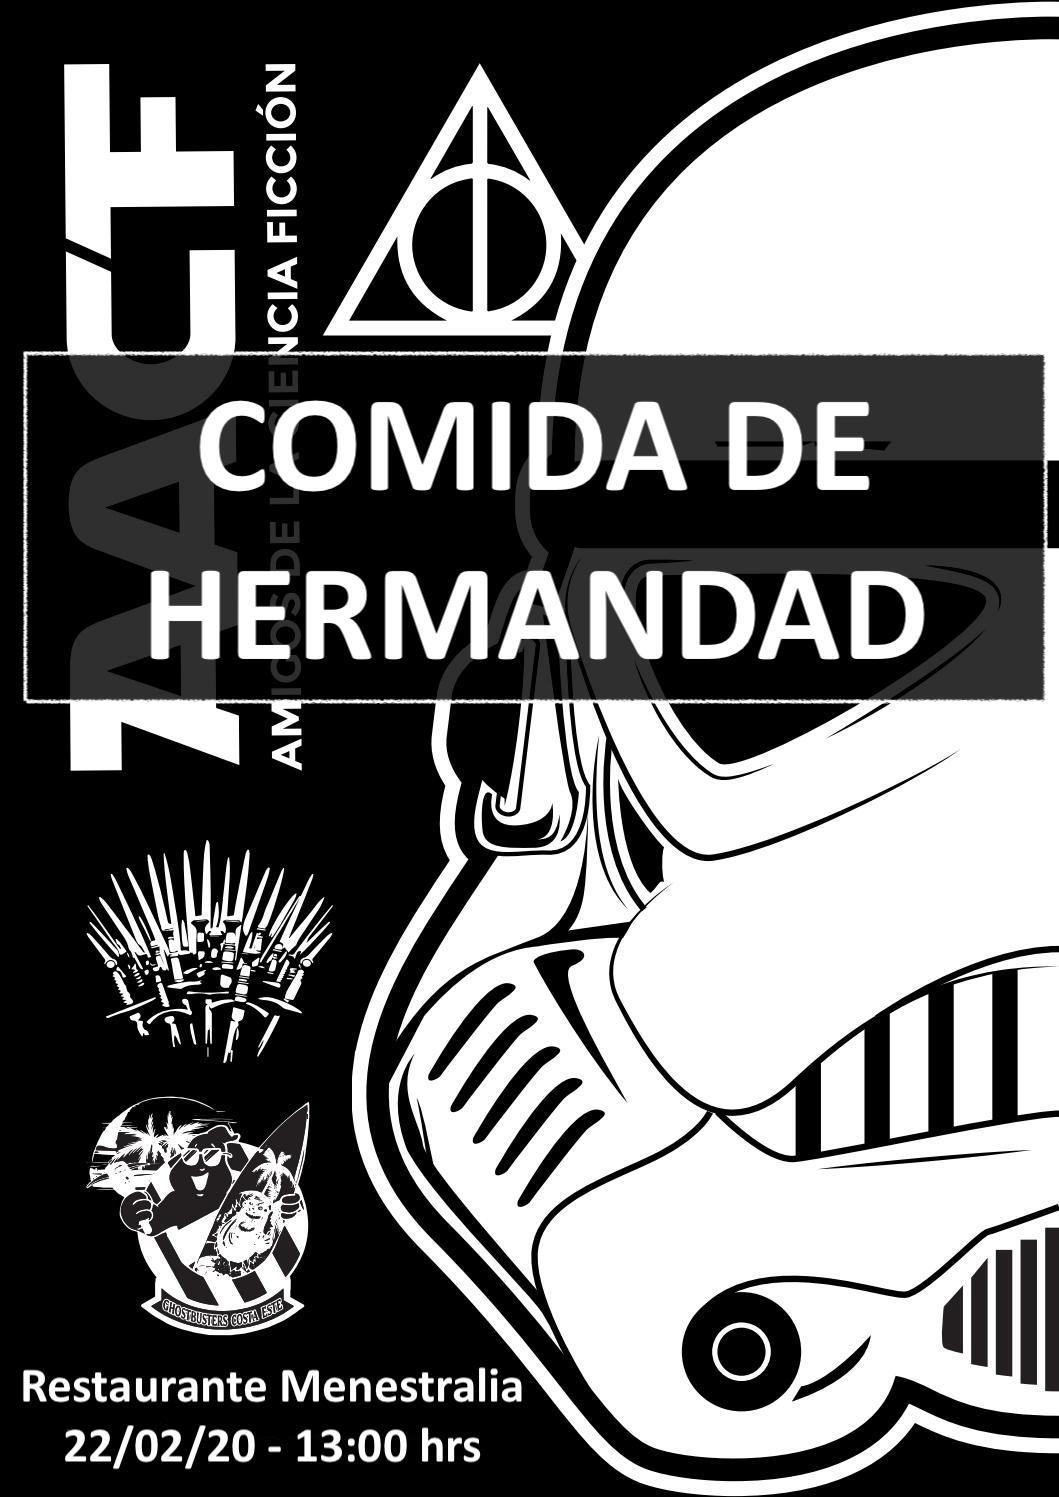 COMIDA DE HERMANDAD AACF (22/02/20) – RTE. MENESTRALIA